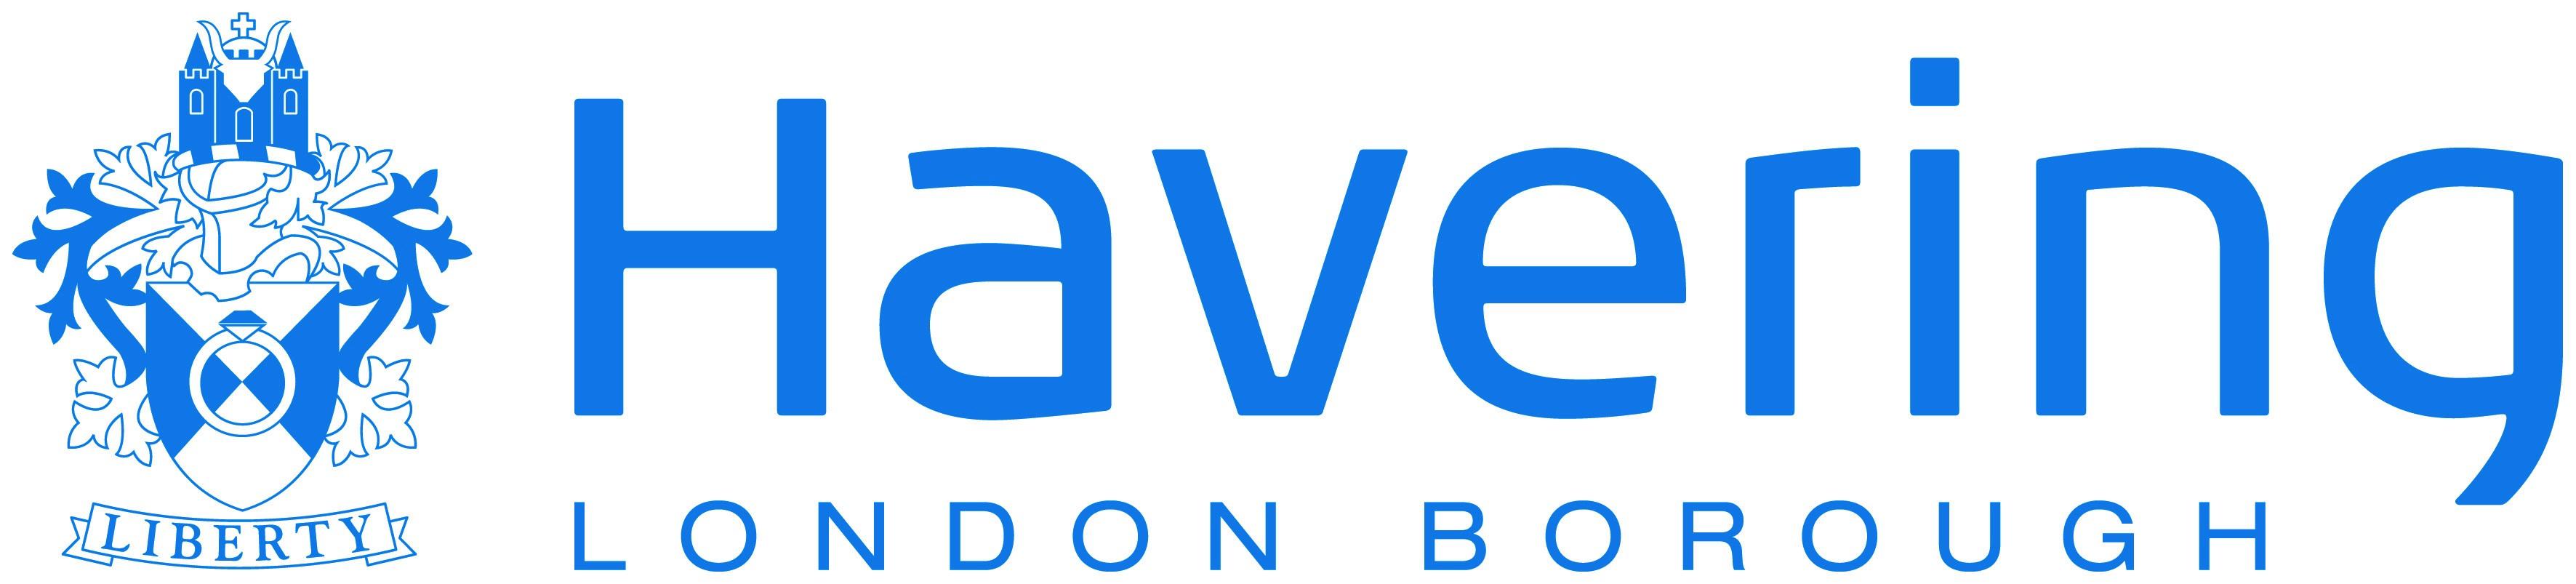 London Borough of Havering logo